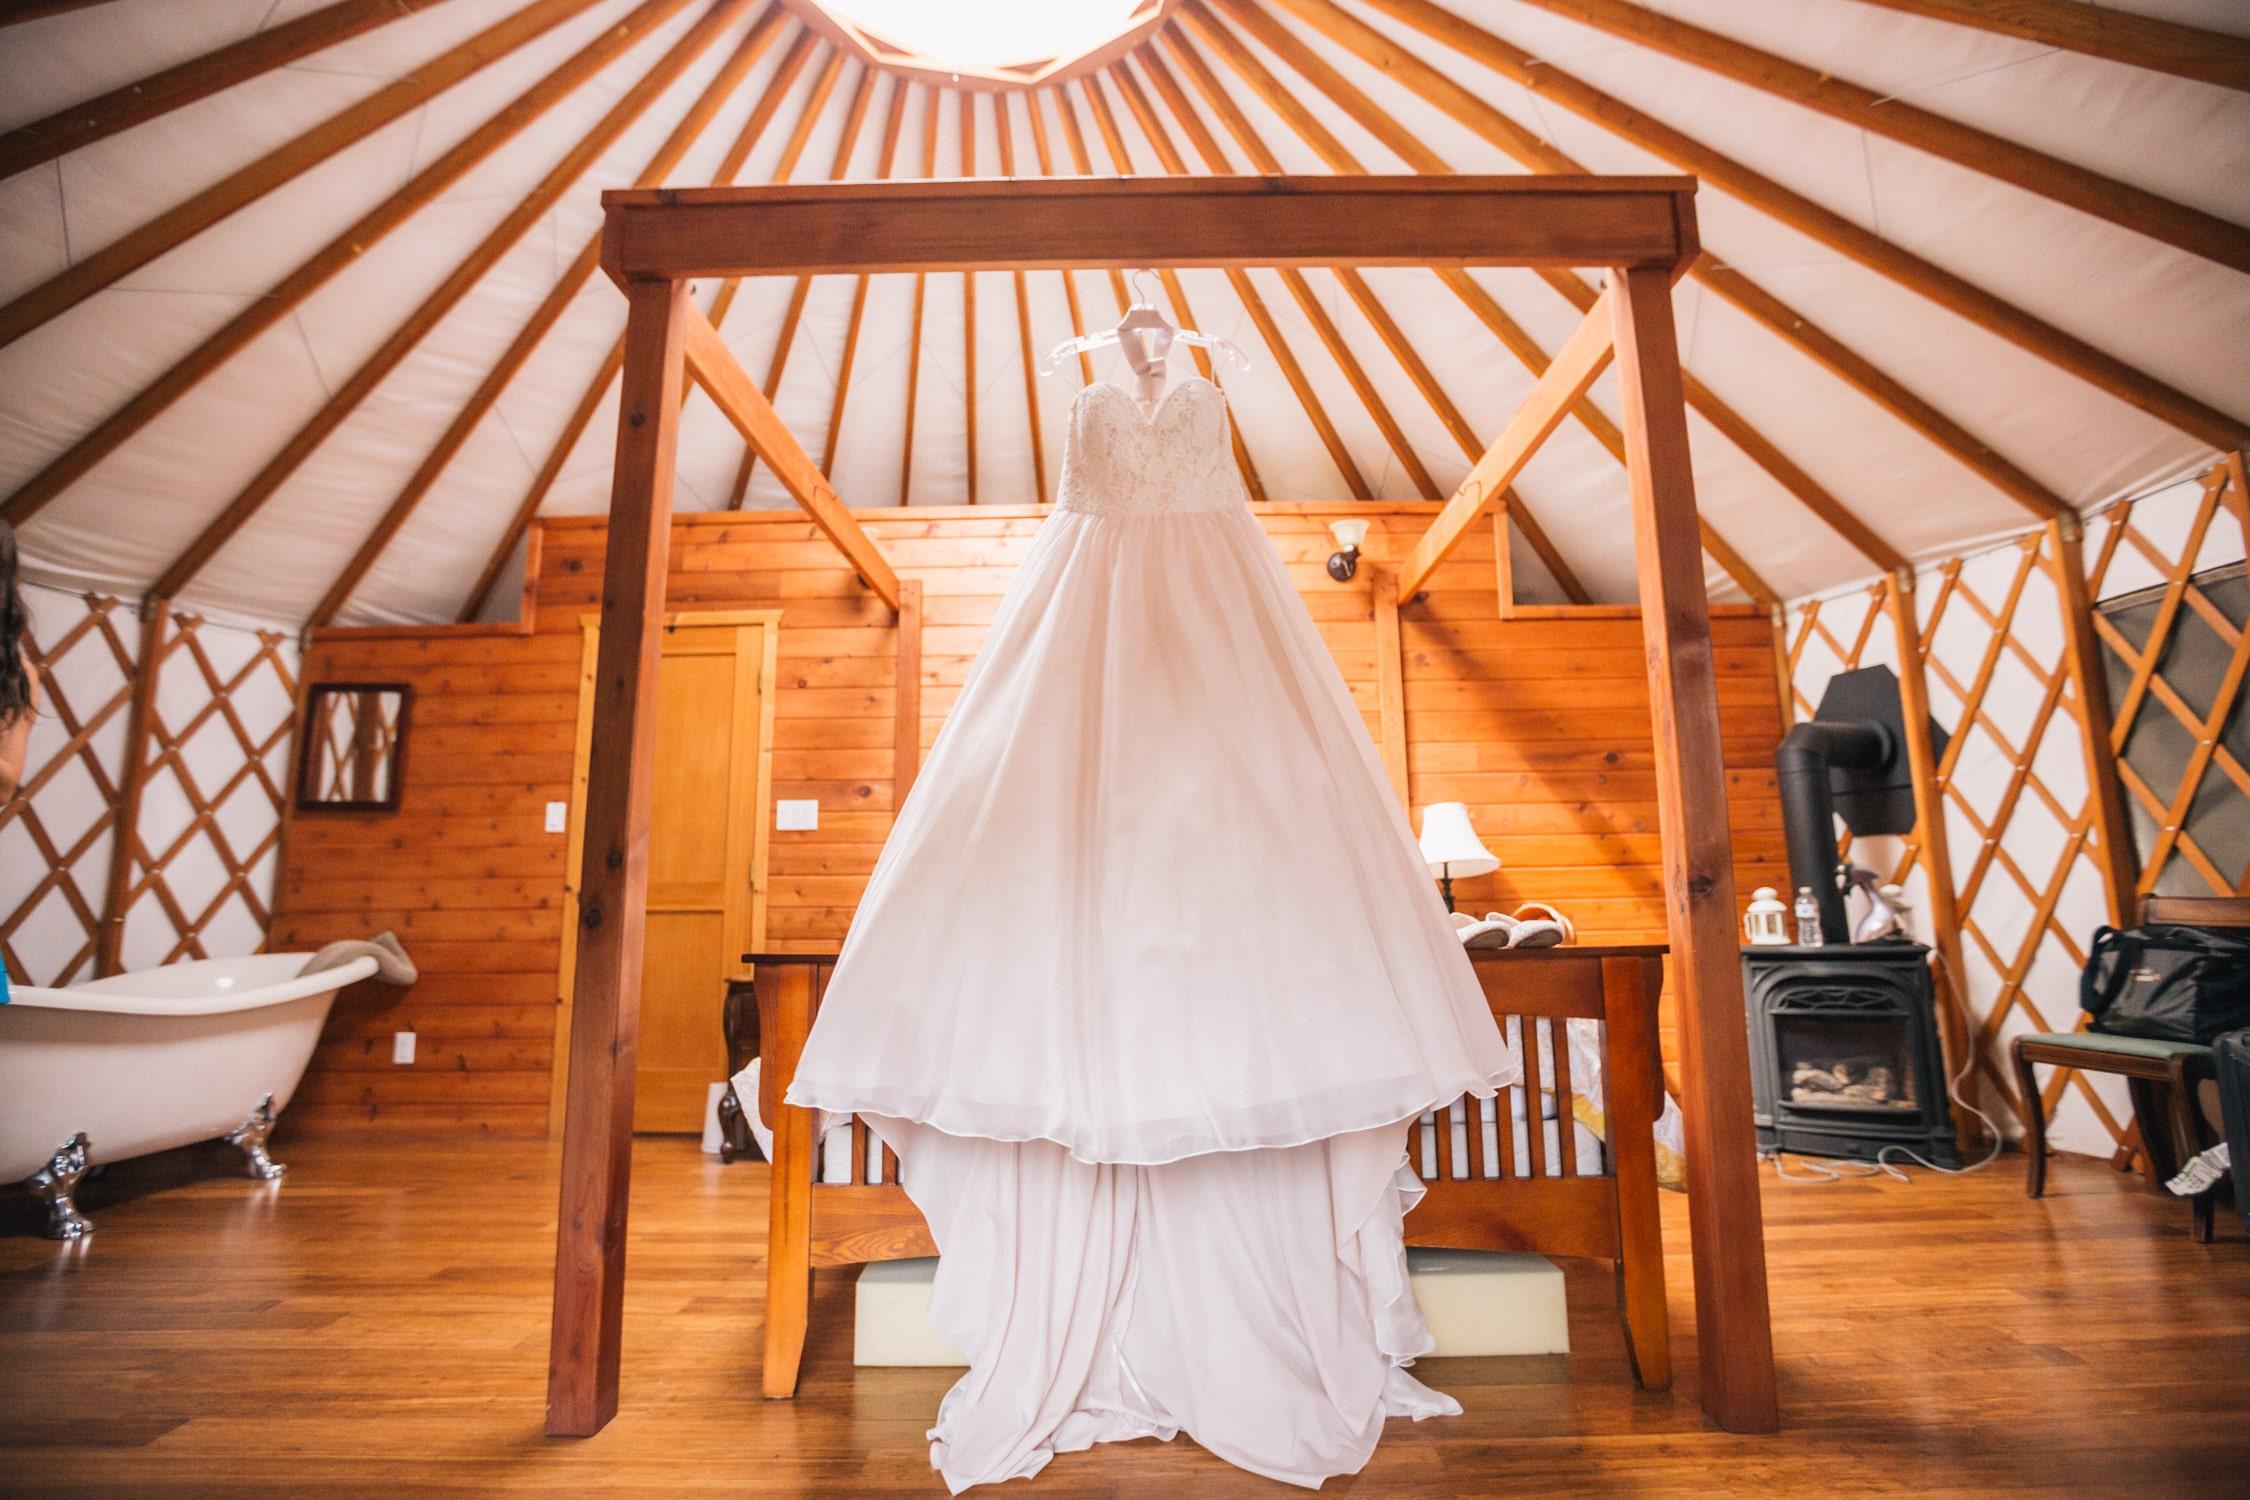 Interior of yarlington bridal suite yurt, wedding dress hanging above bed - Merridale Wedding Venue Vancouver Island- taken by Marlboro Wang Photo | Focal bookfocal.com